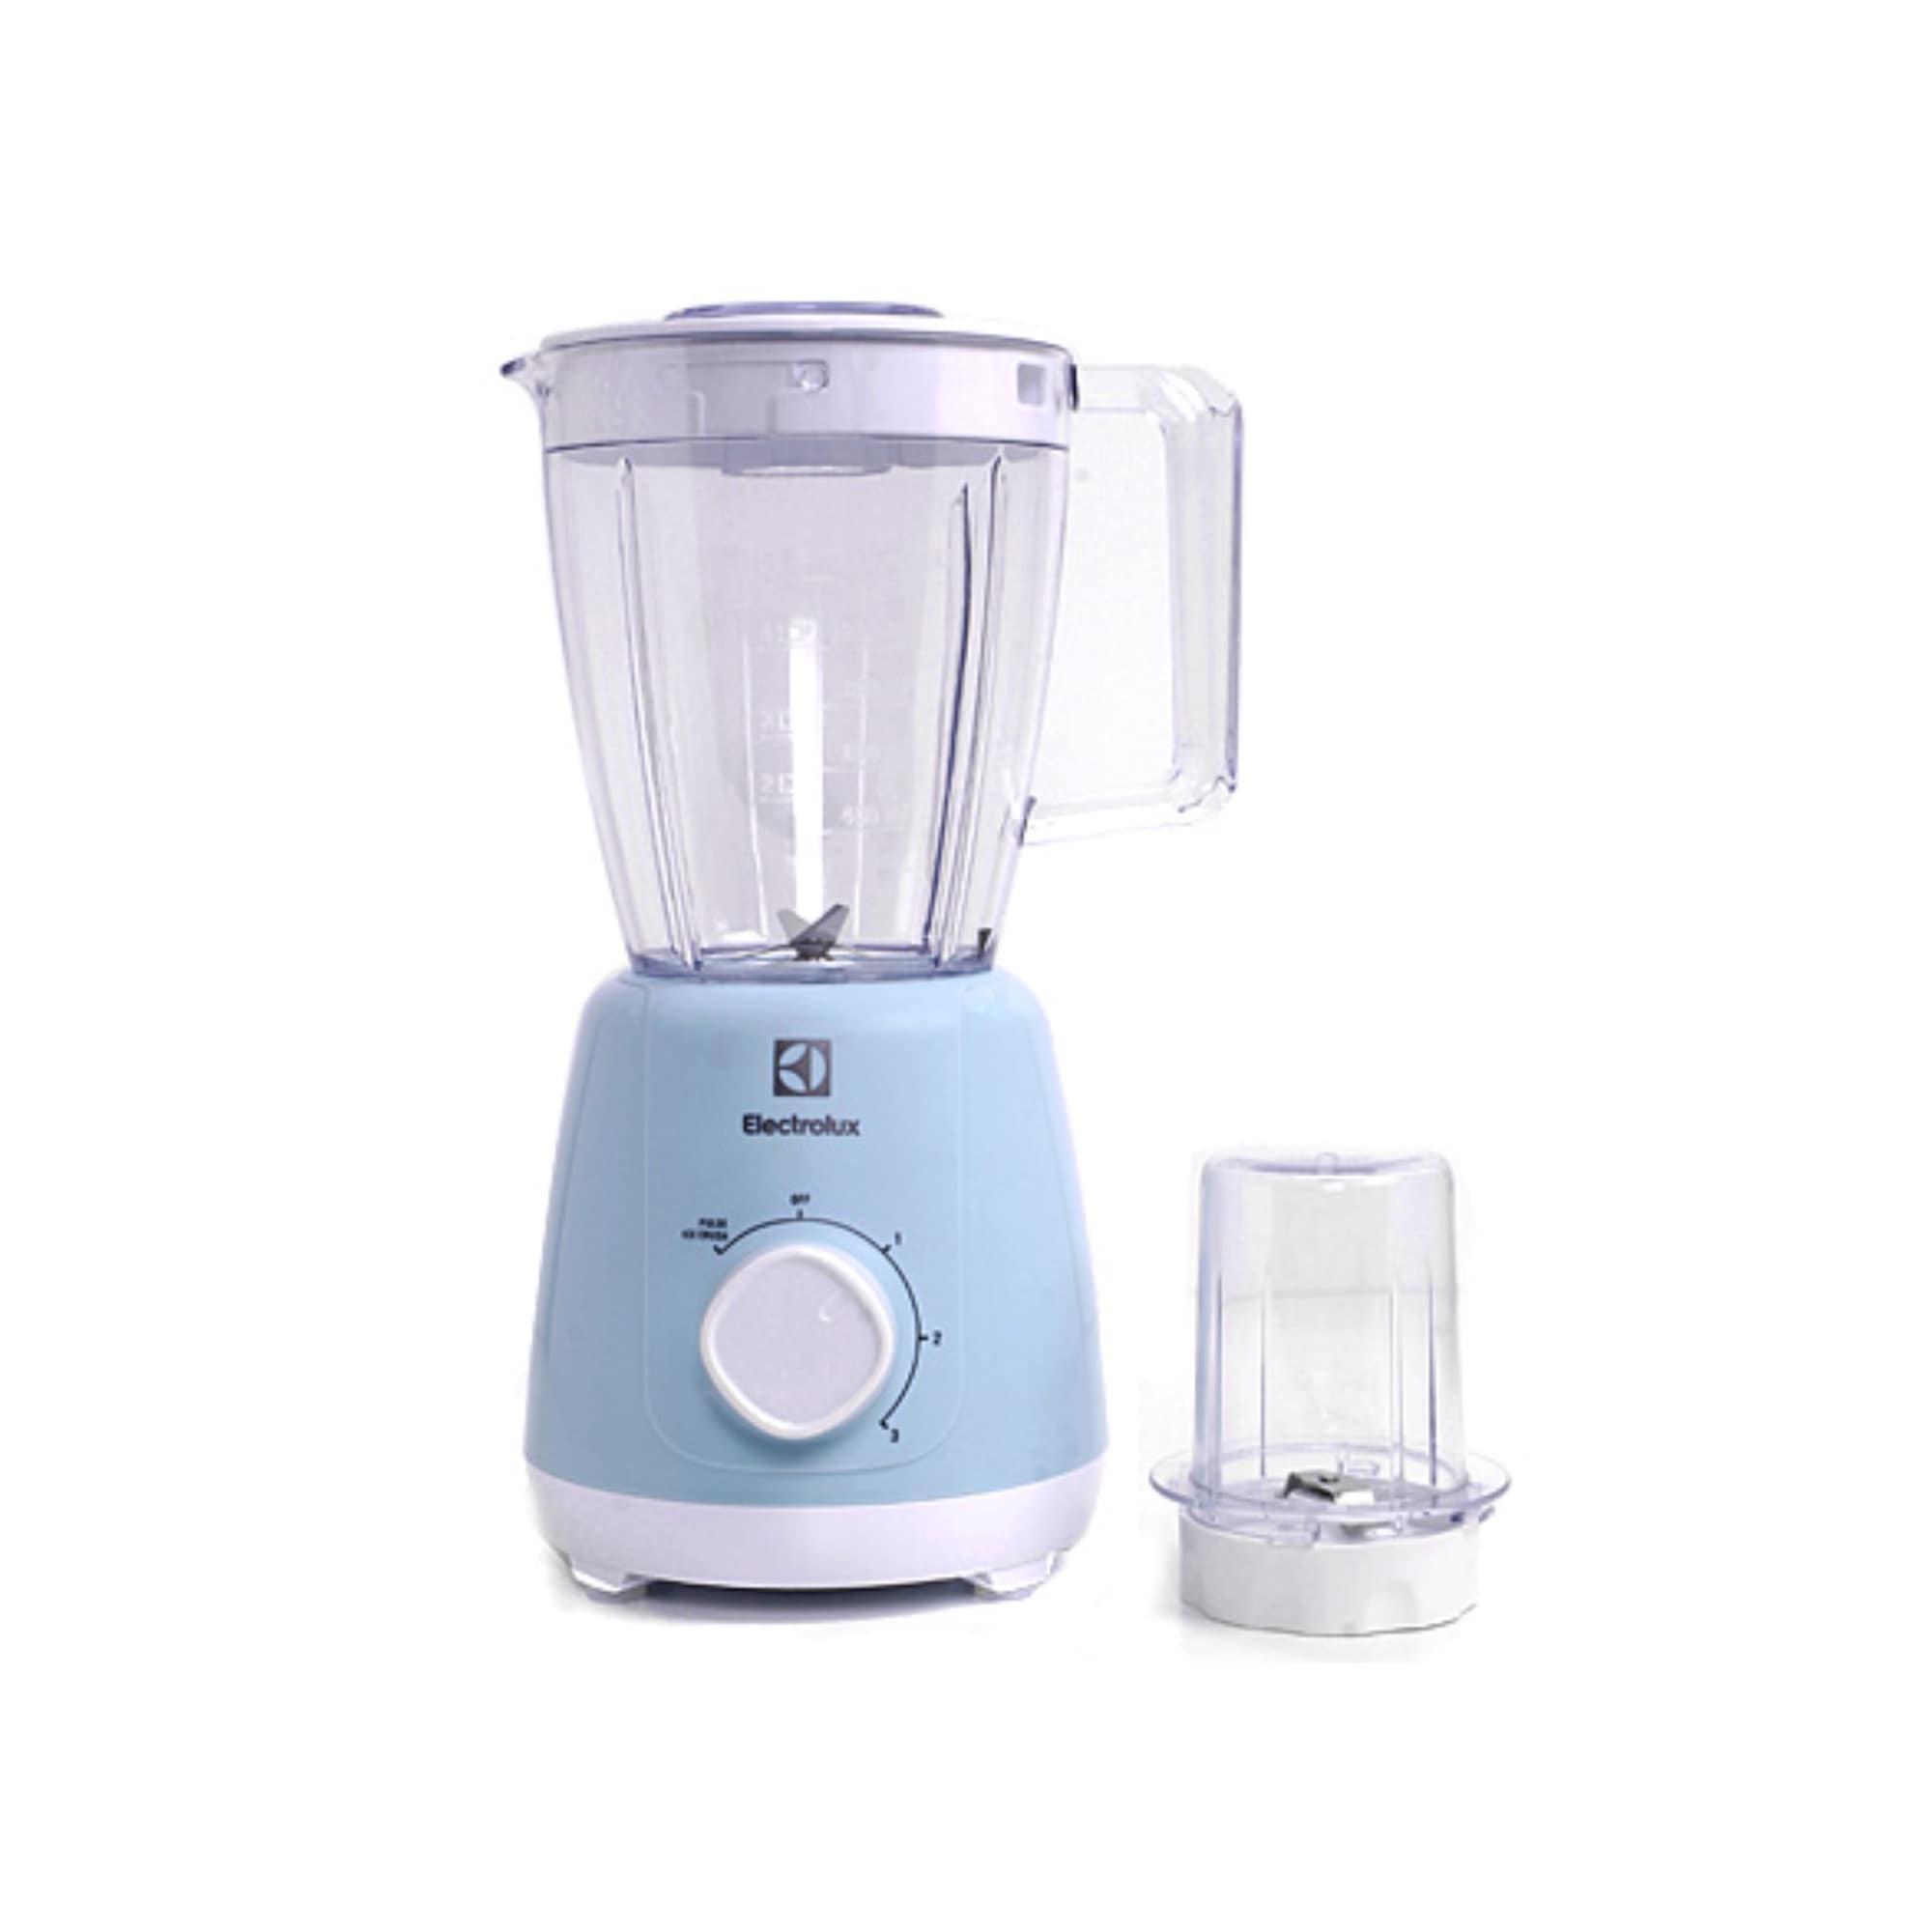 electrolux blender ebr3416 400w 1 5 end 5 2 2020 4 36 pm rh lelong com my Washing Machine User Manual Washing Machine User Manual